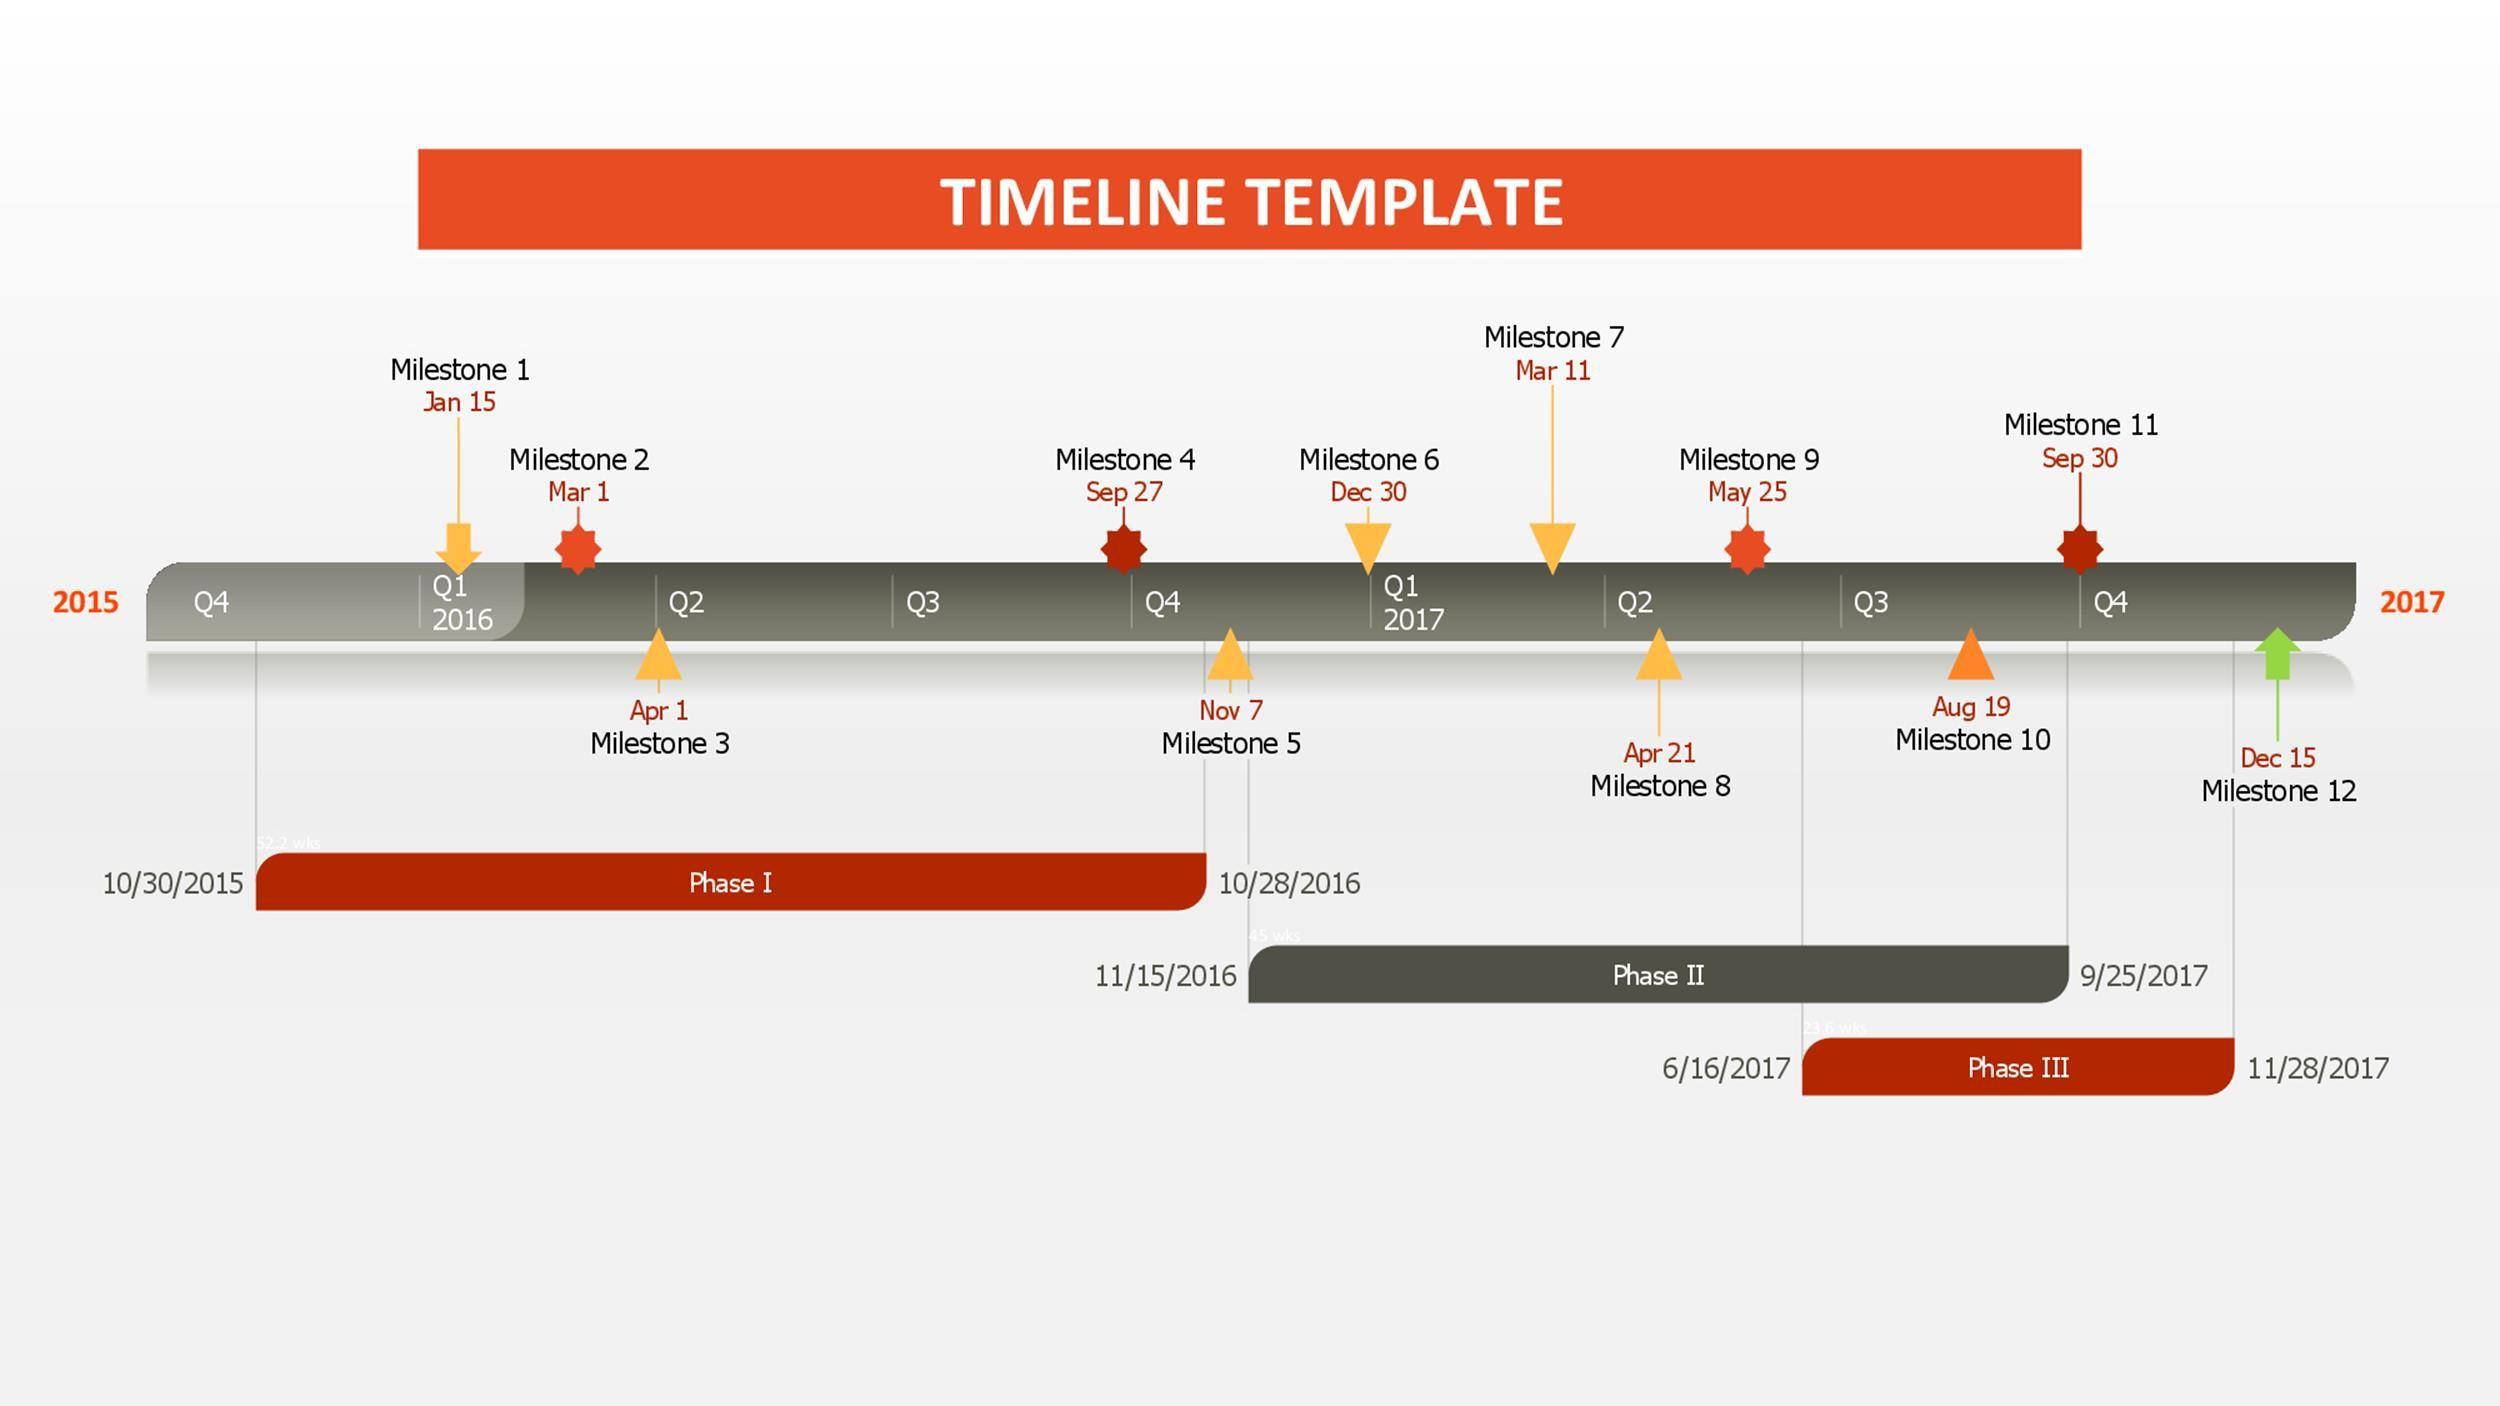 006 Dreaded Timeline Template For Word Idea  Wordpres FreeFull